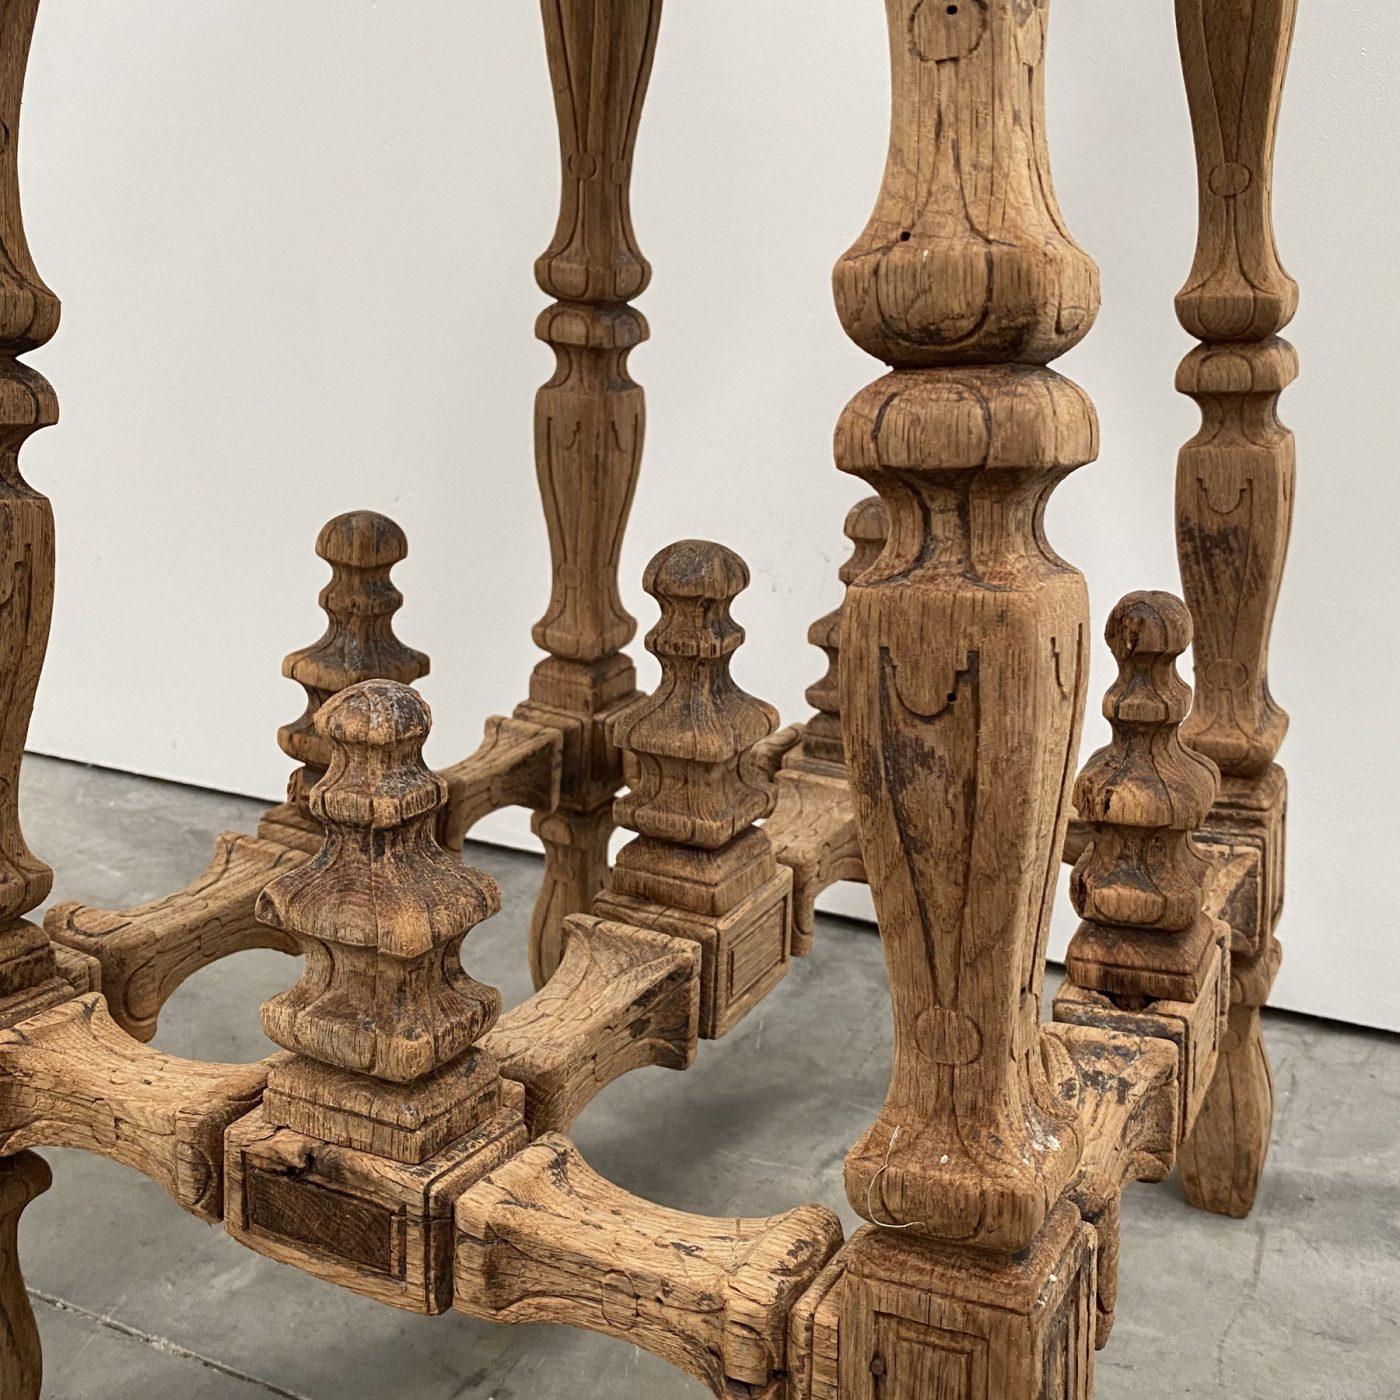 objet-vagabond-sculptor-table0005